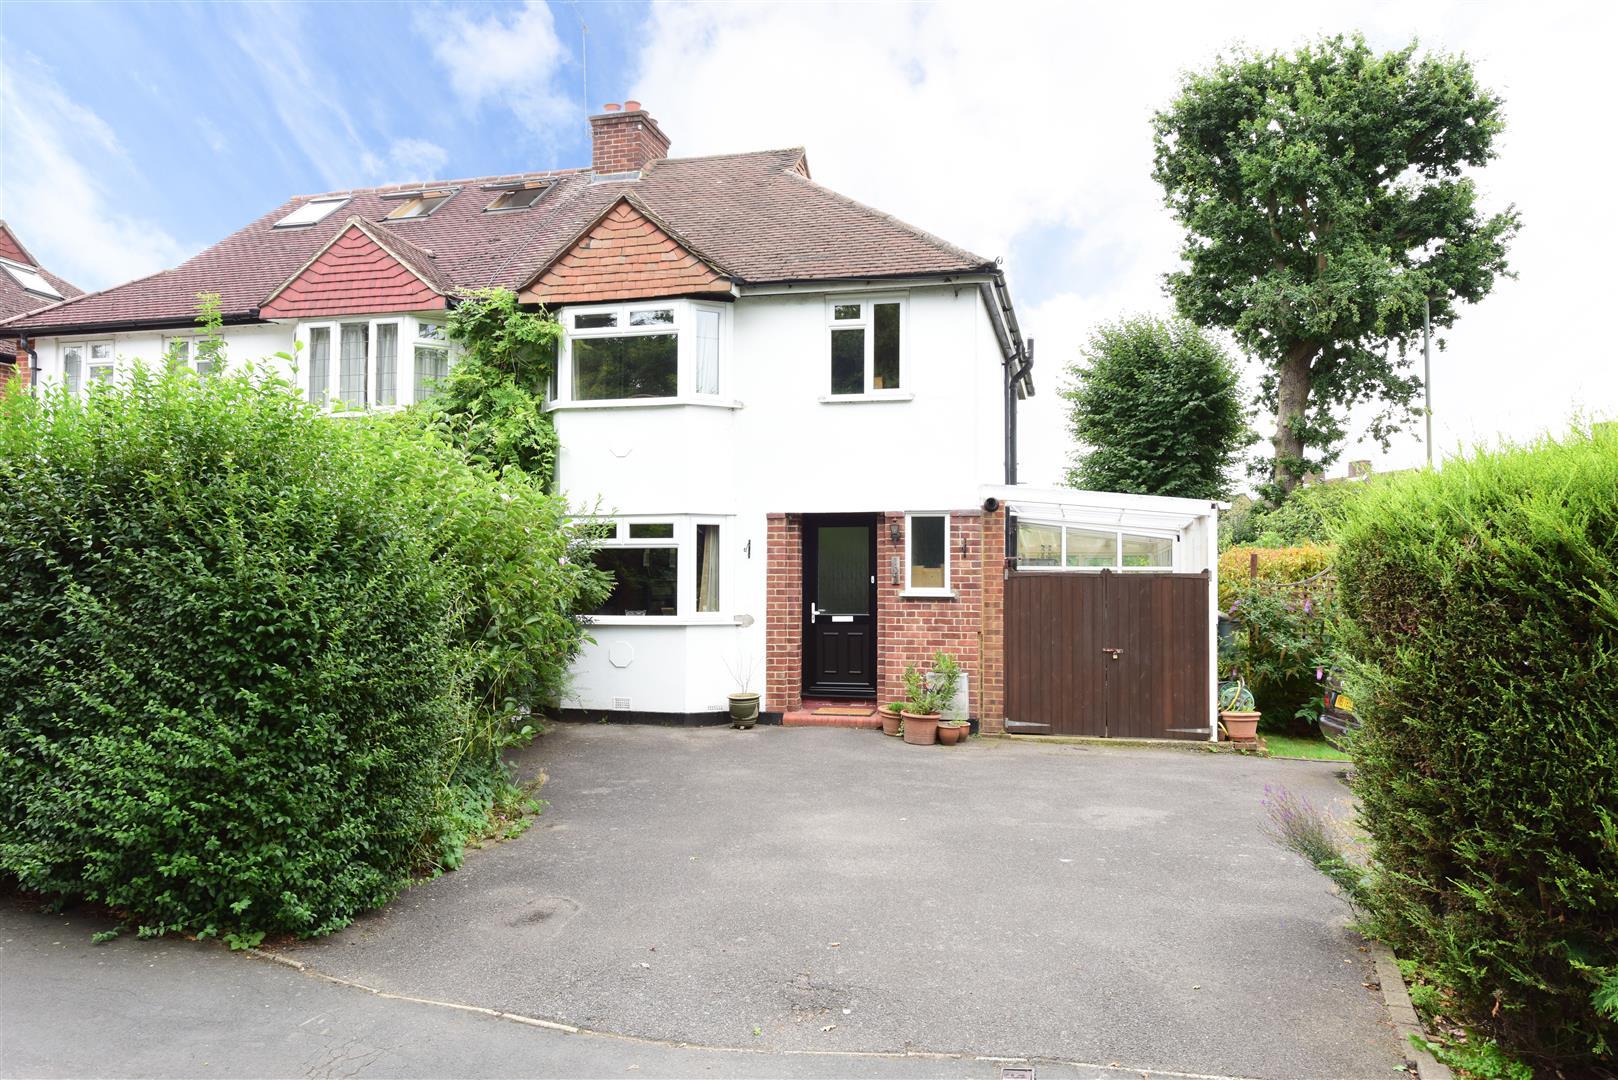 3 Bedrooms Property for sale in Westcar Lane, Hersham, Walton-On-Thames